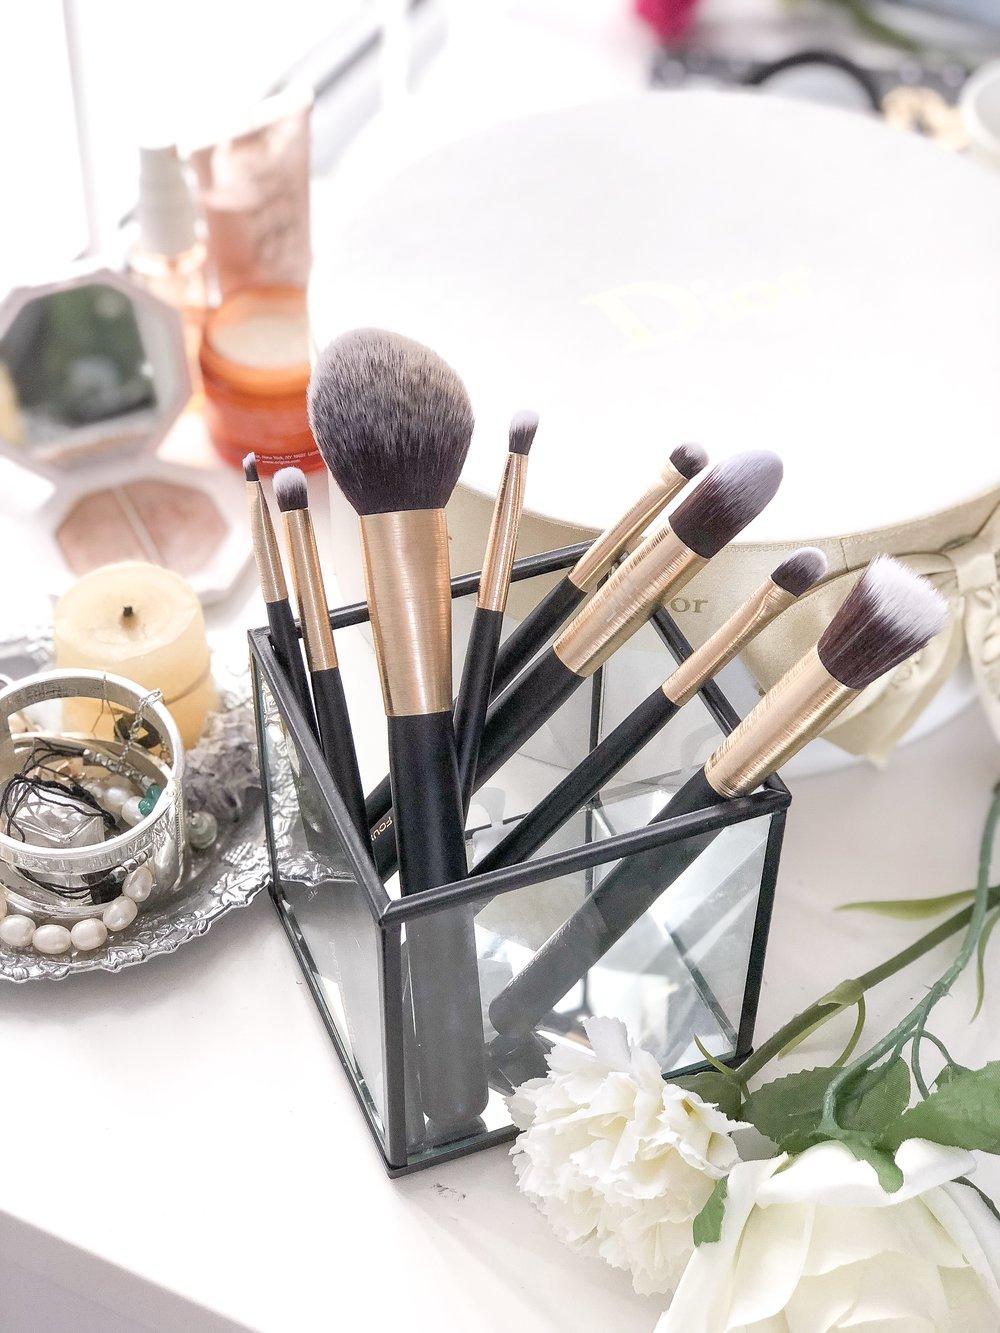 Australian Masey Cosmetics brushes review